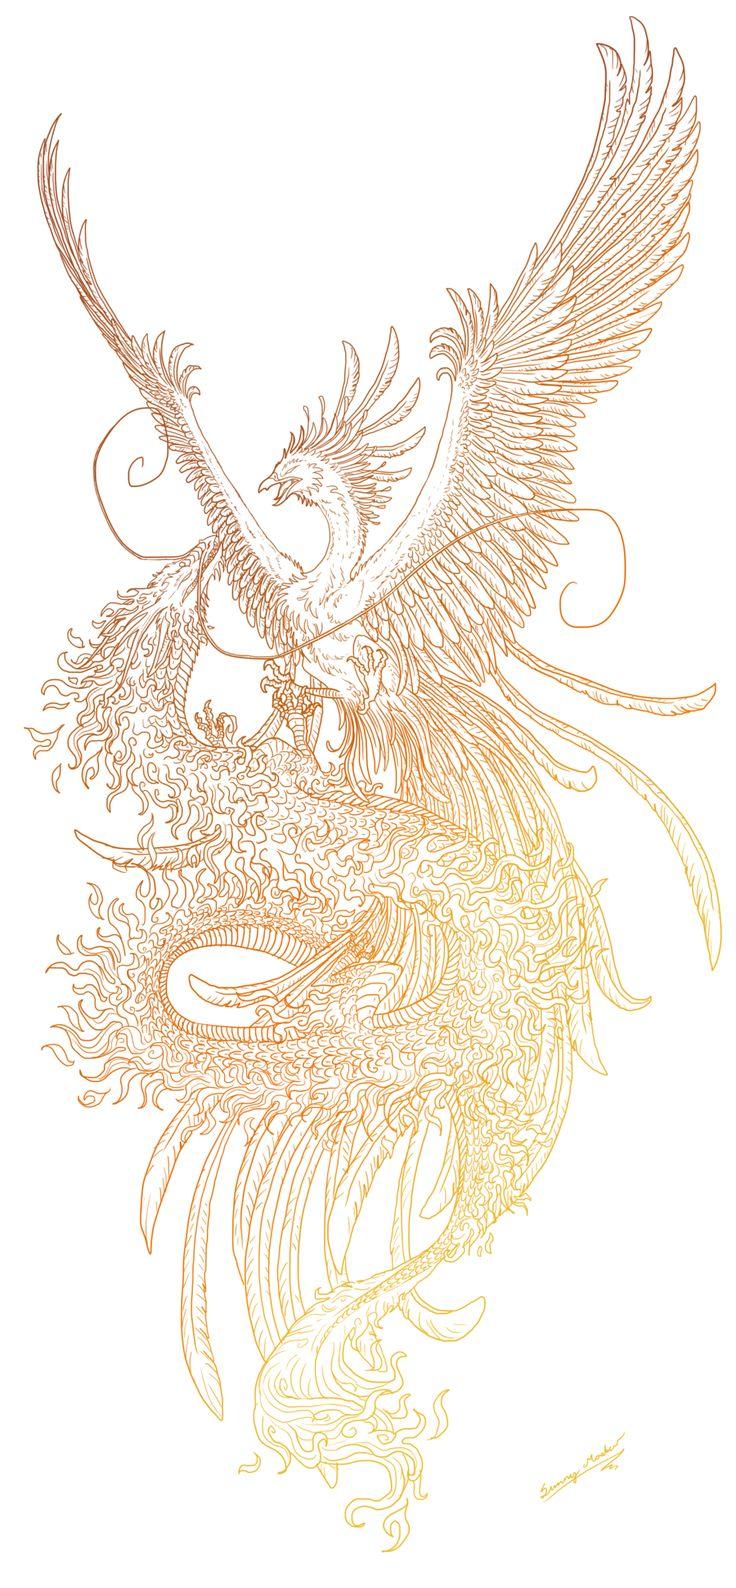 Phoenix and dragon lineart by Sunima.deviantart.com on @deviantART